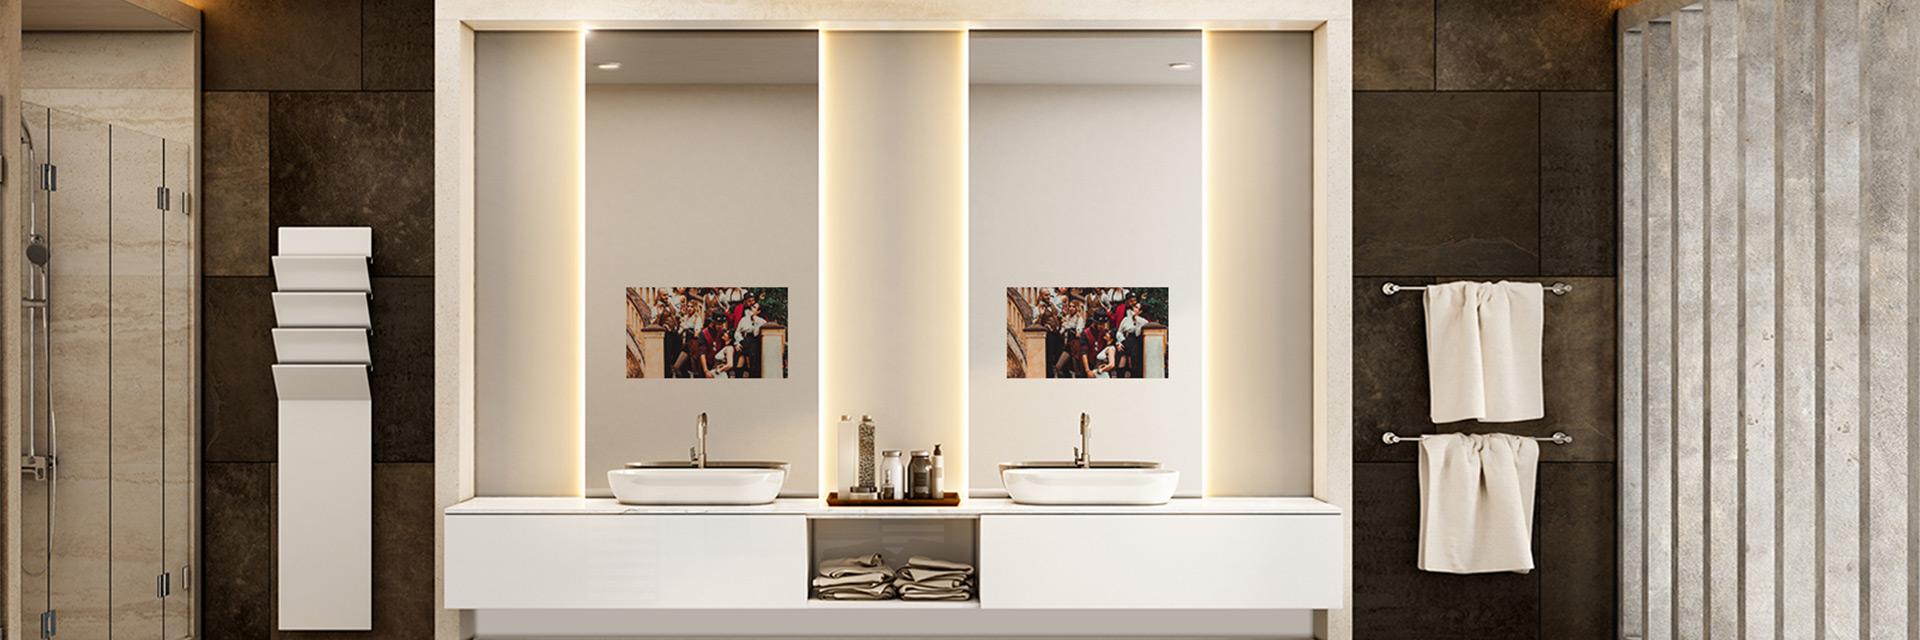 MirrorVue Mirror TV Integrated with Backlit Mirror